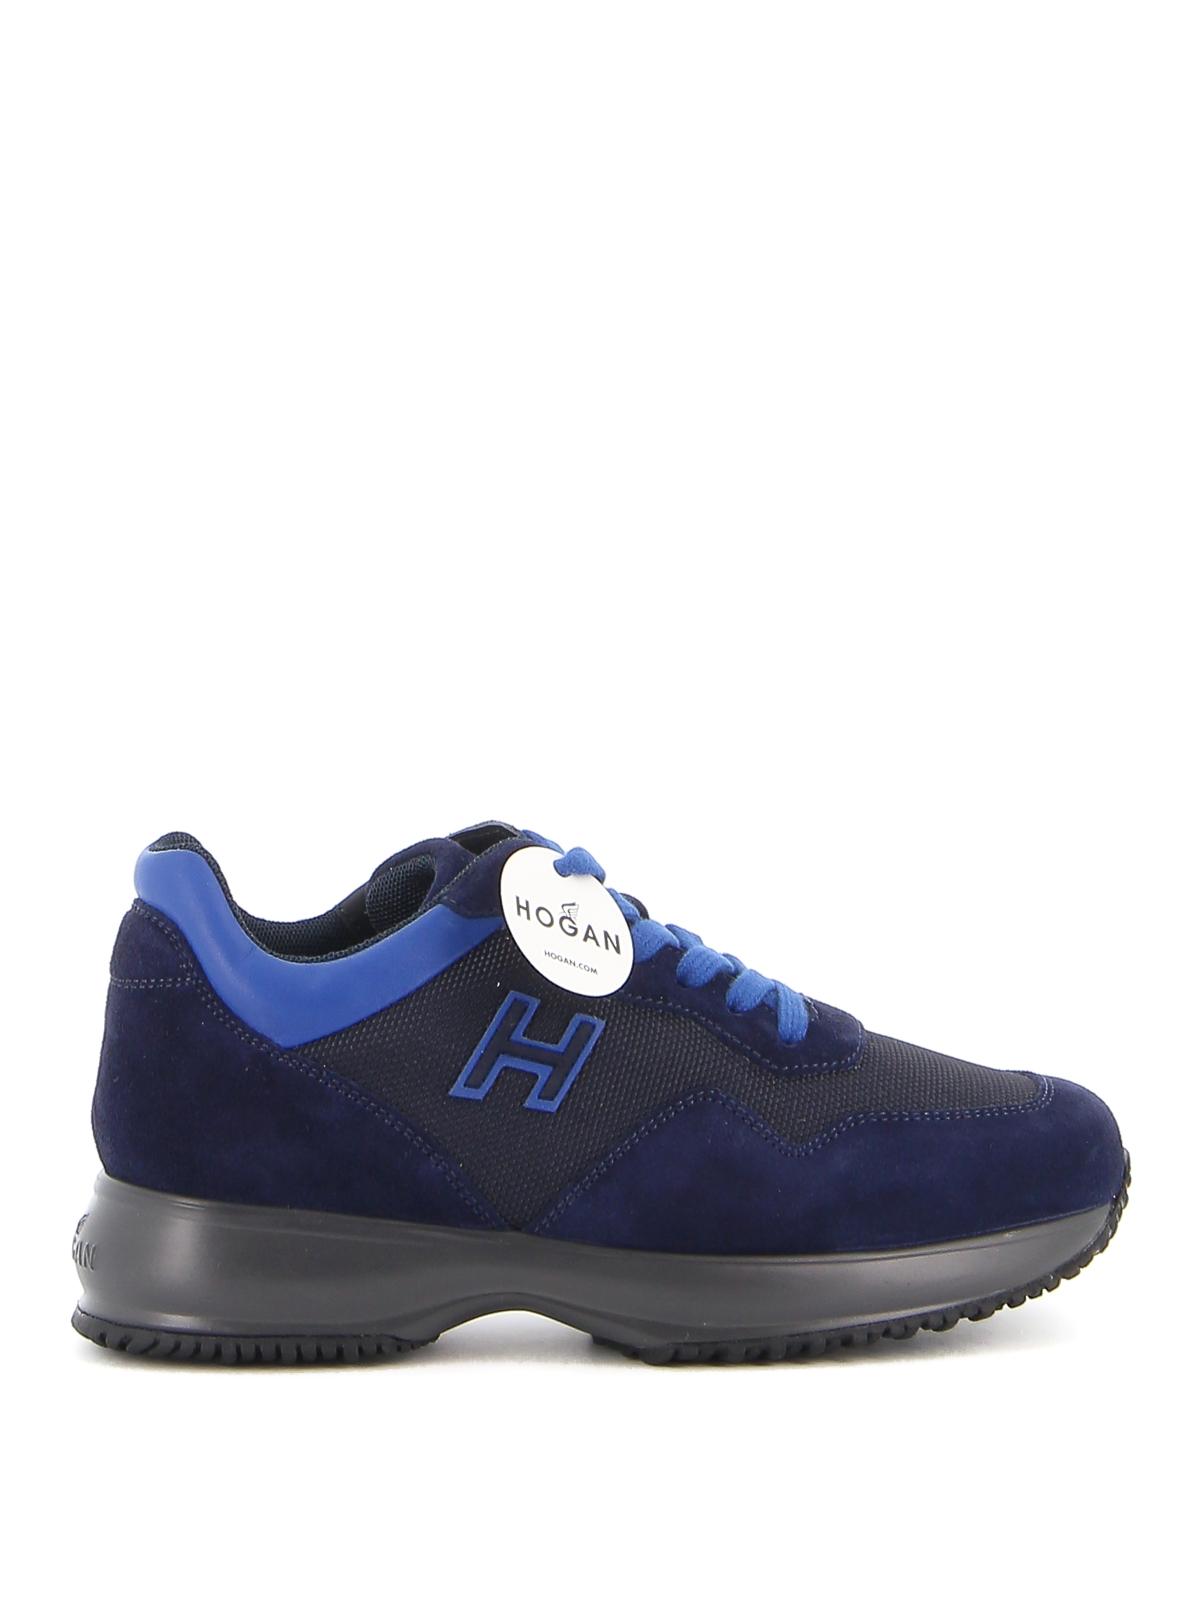 Hogan Junior - Interactive sneakers - trainers - HXC00N0V310JYCT02V